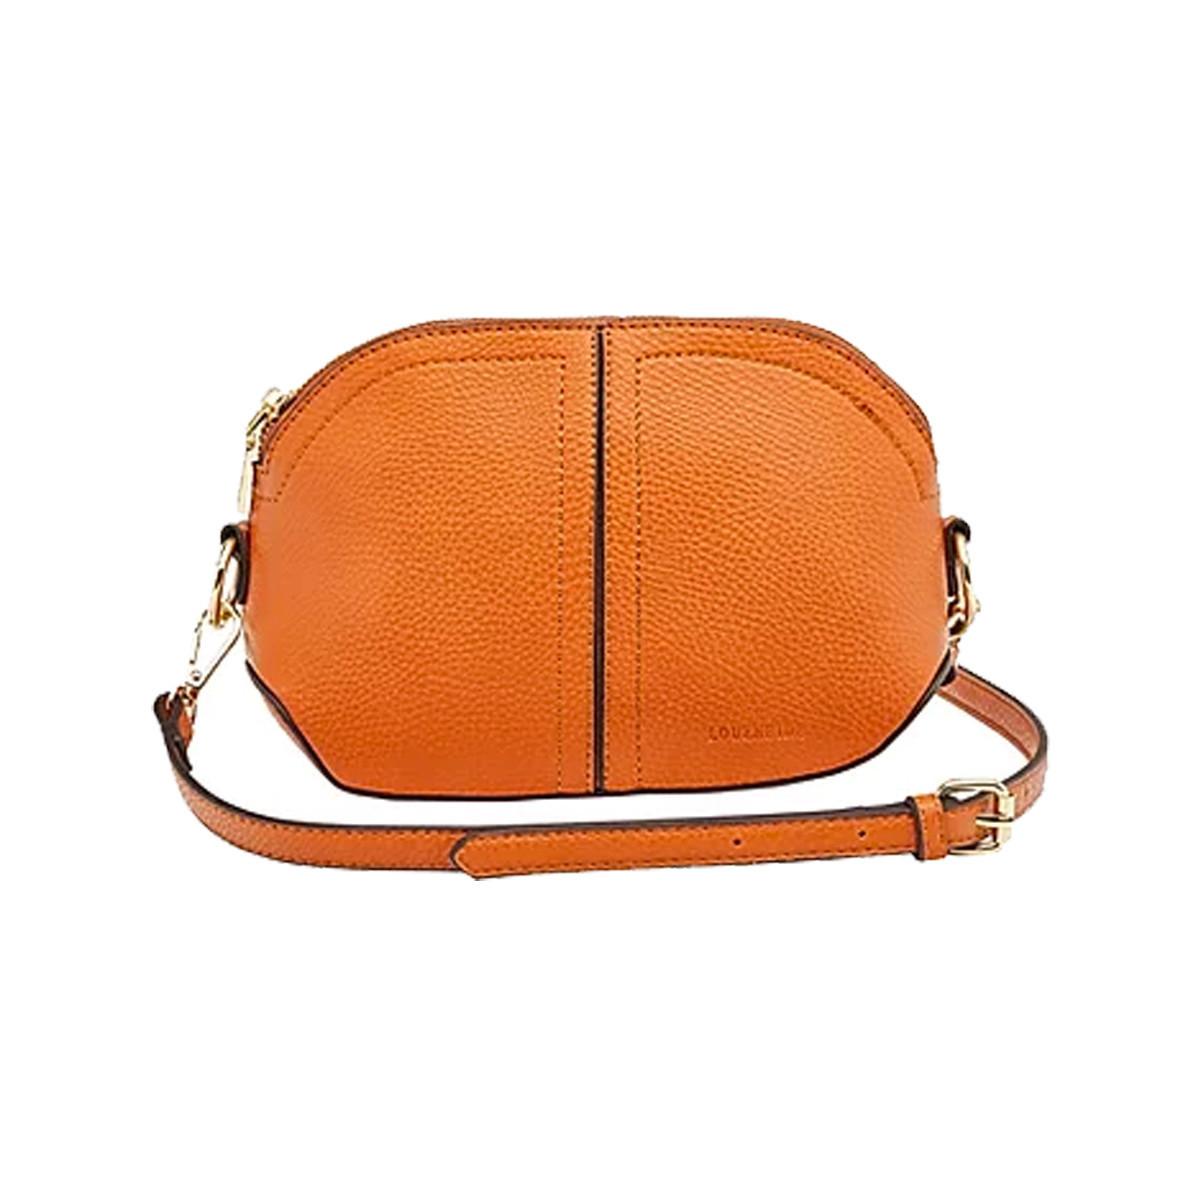 Louenhide Jasmine Crossbody Handbag